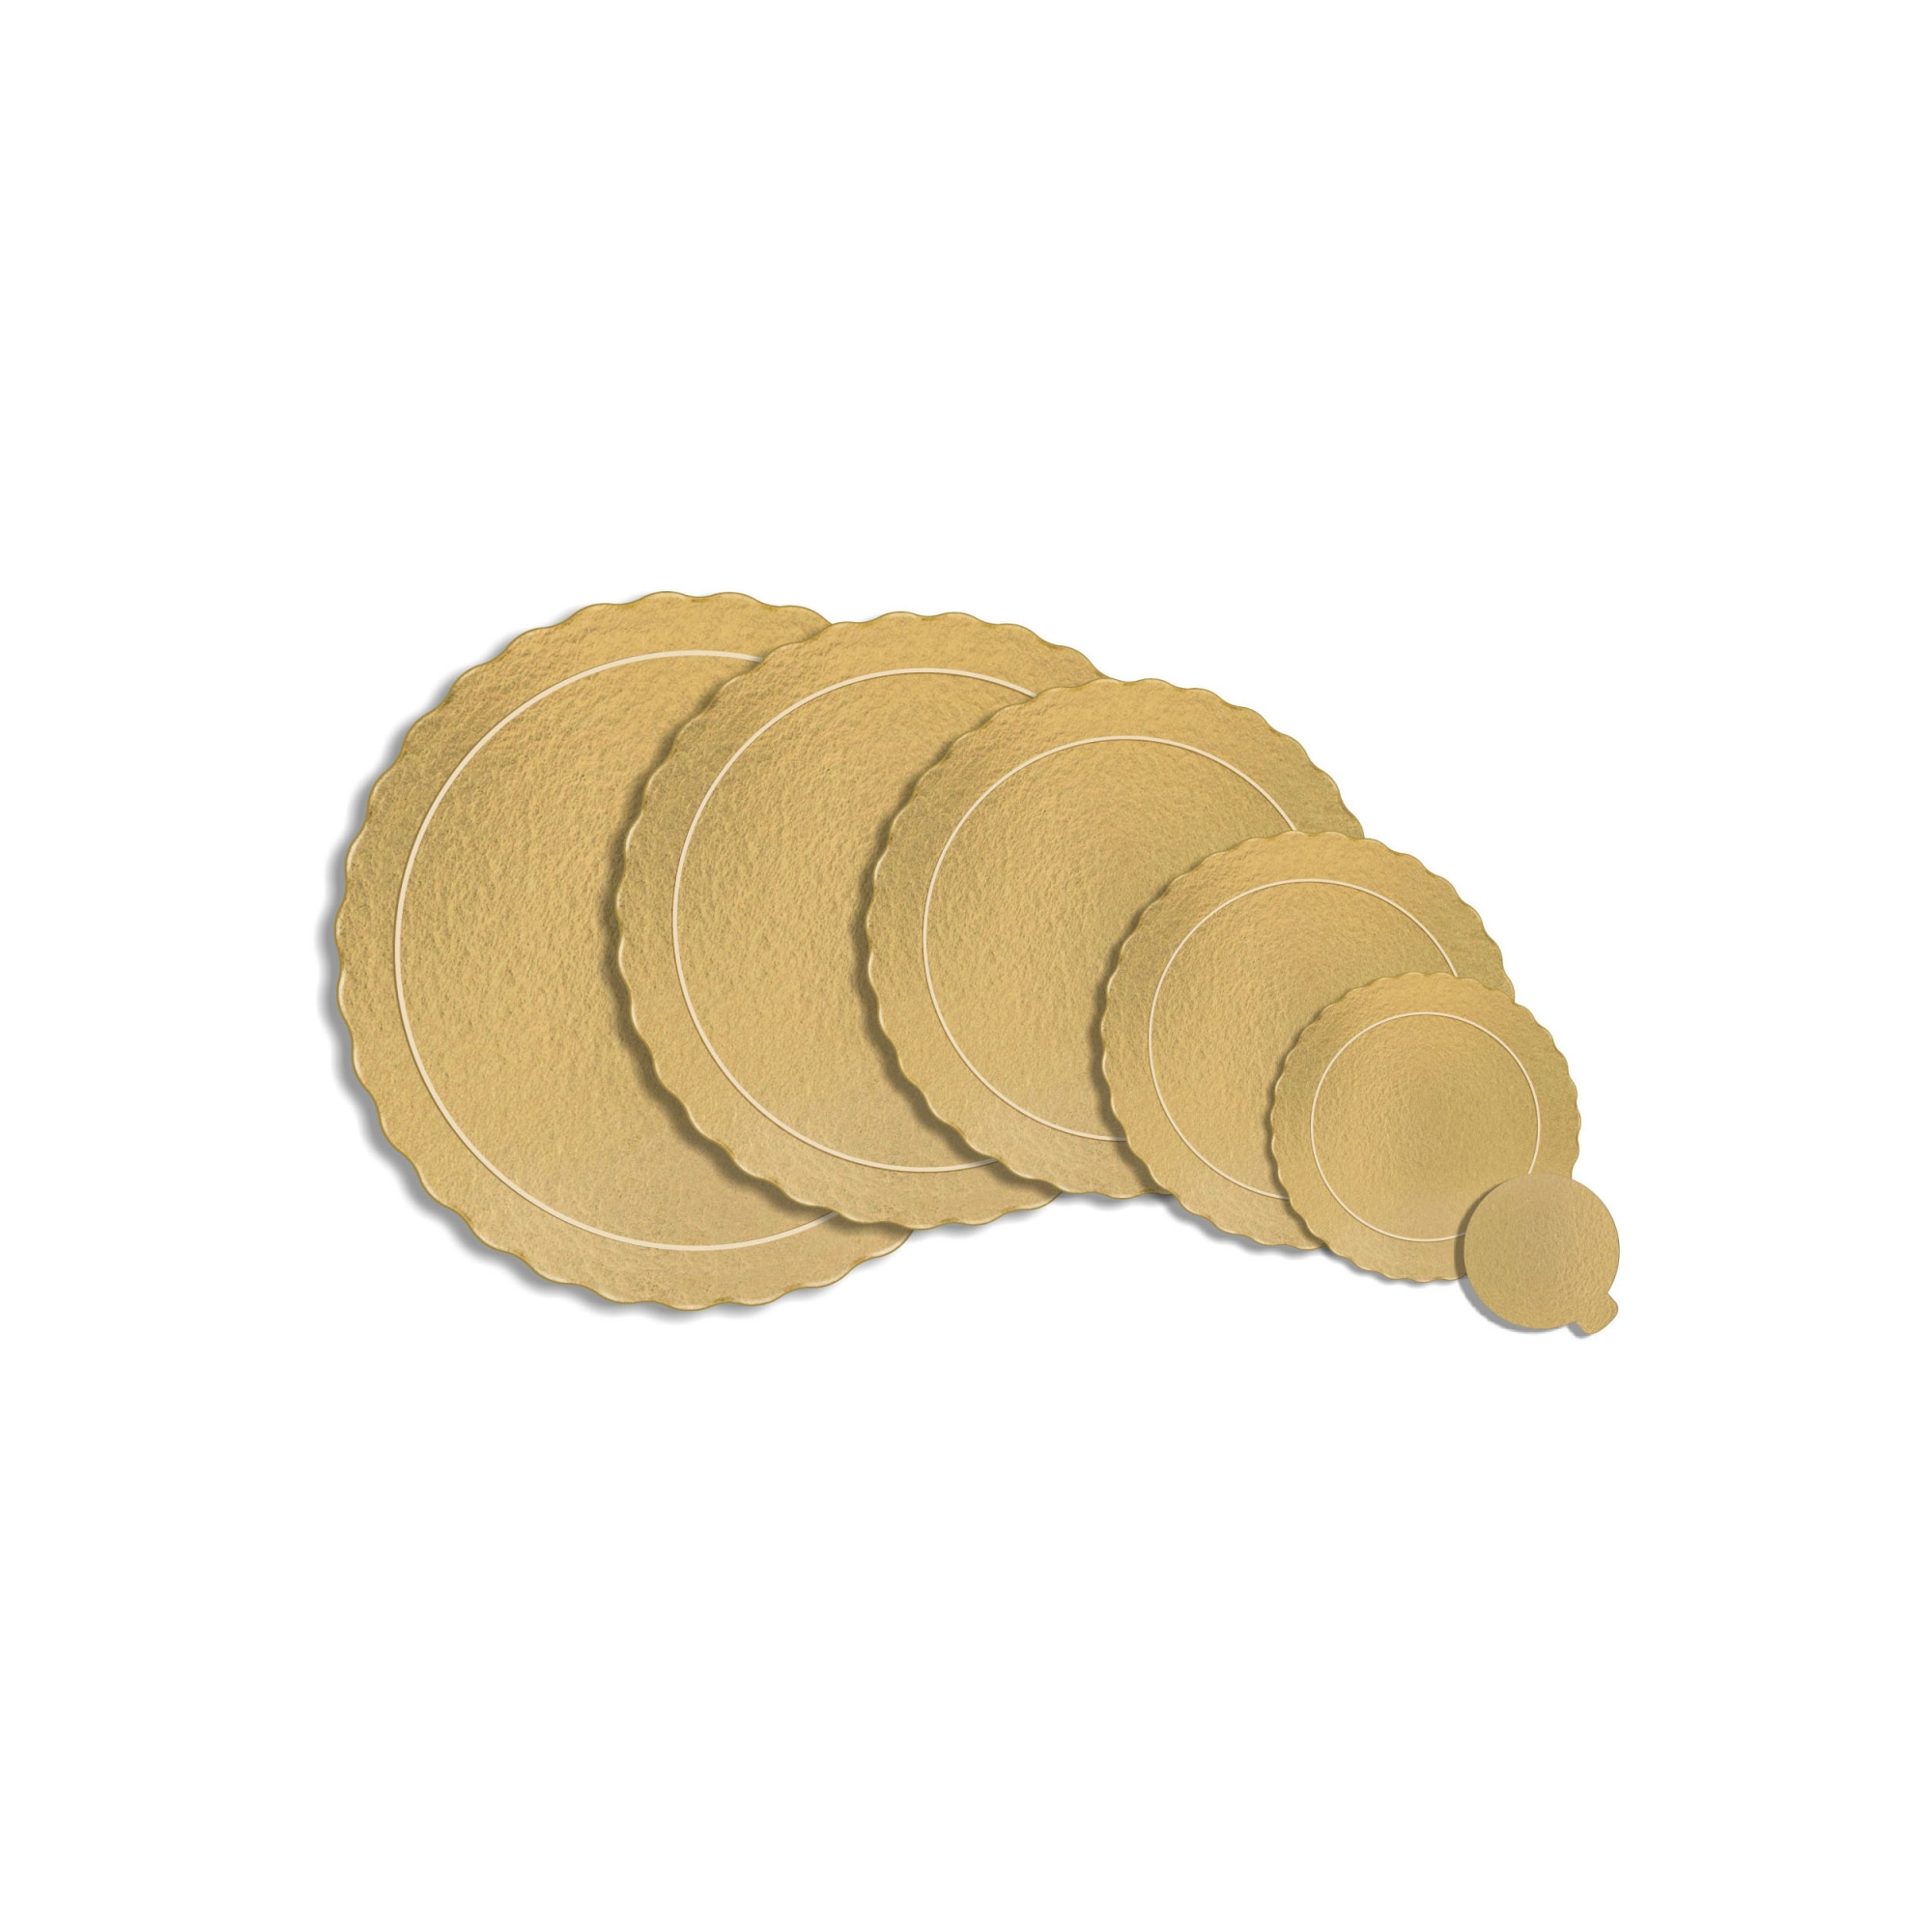 50 Bases Laminadas, Suporte P/ Bolo, Cake Board, Kit 20 e 30cm - Ouro